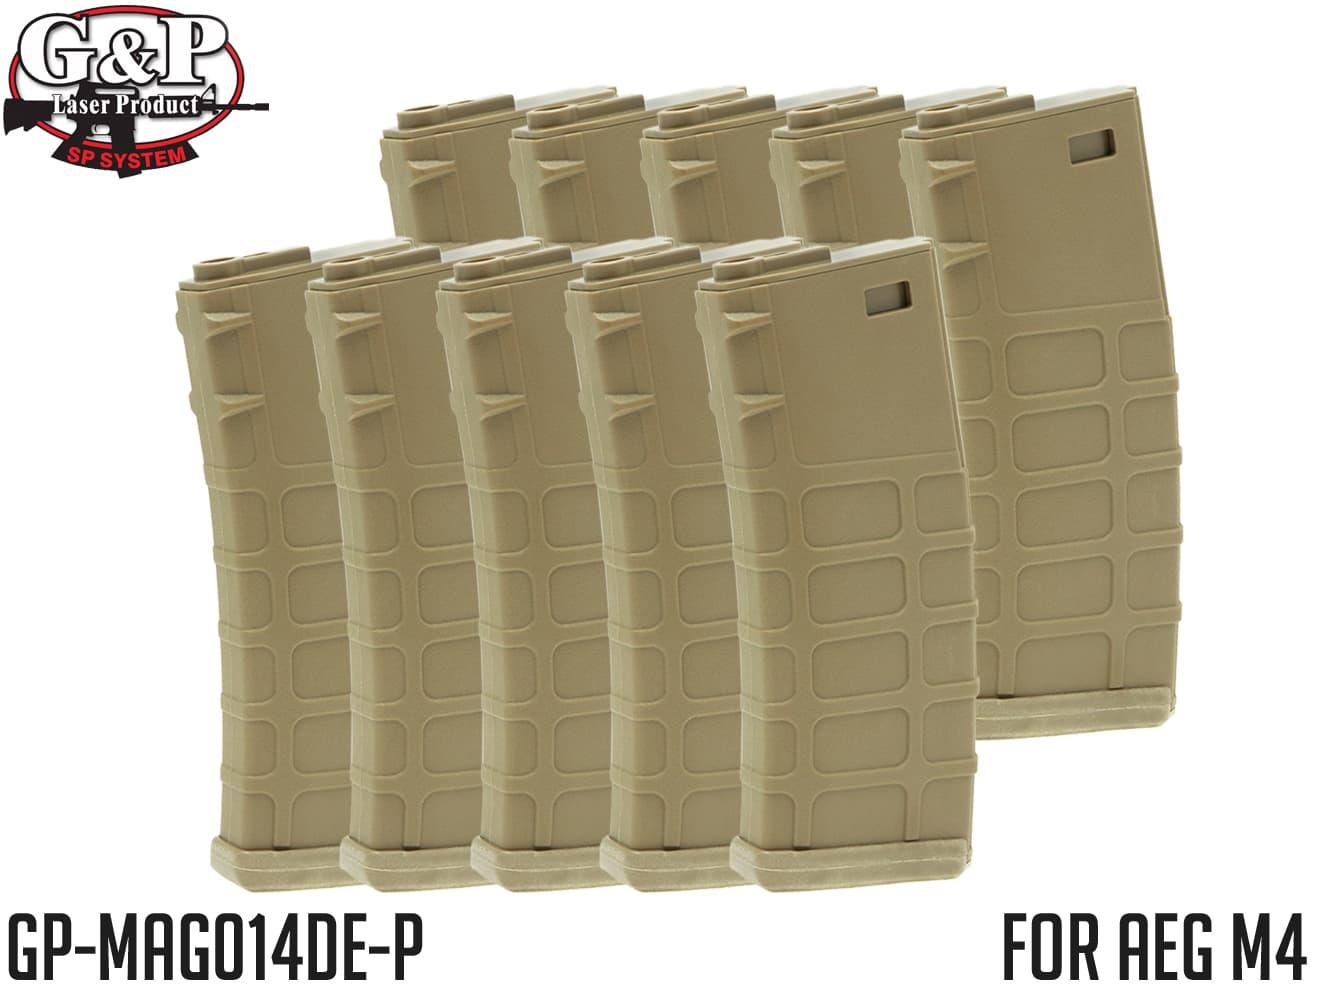 G&P GMAG 130Rds マガジン AEG M4 FDE 10本セット◆MADBULLライセンス バネ式 MID CAP 電動M4対応 G&G KRYTAC ICS ARES APS S&T VFC WE